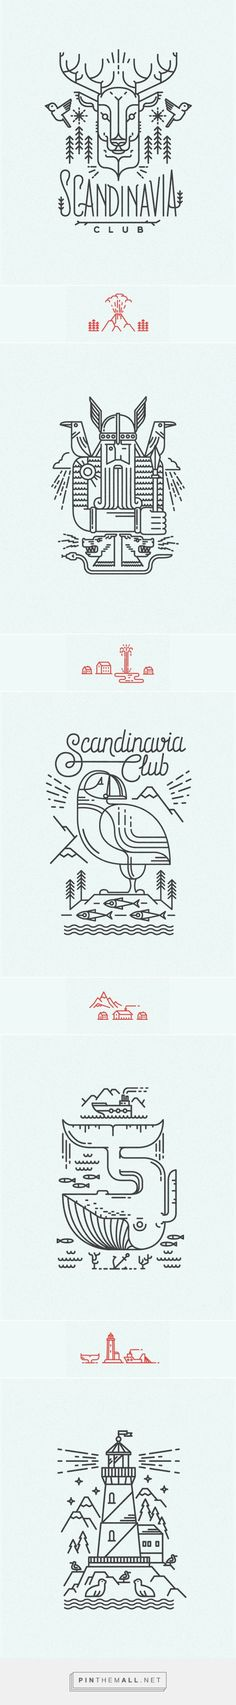 Scandinavian line illustrations for Scandinavia Club in Moscow | #illustration #design: